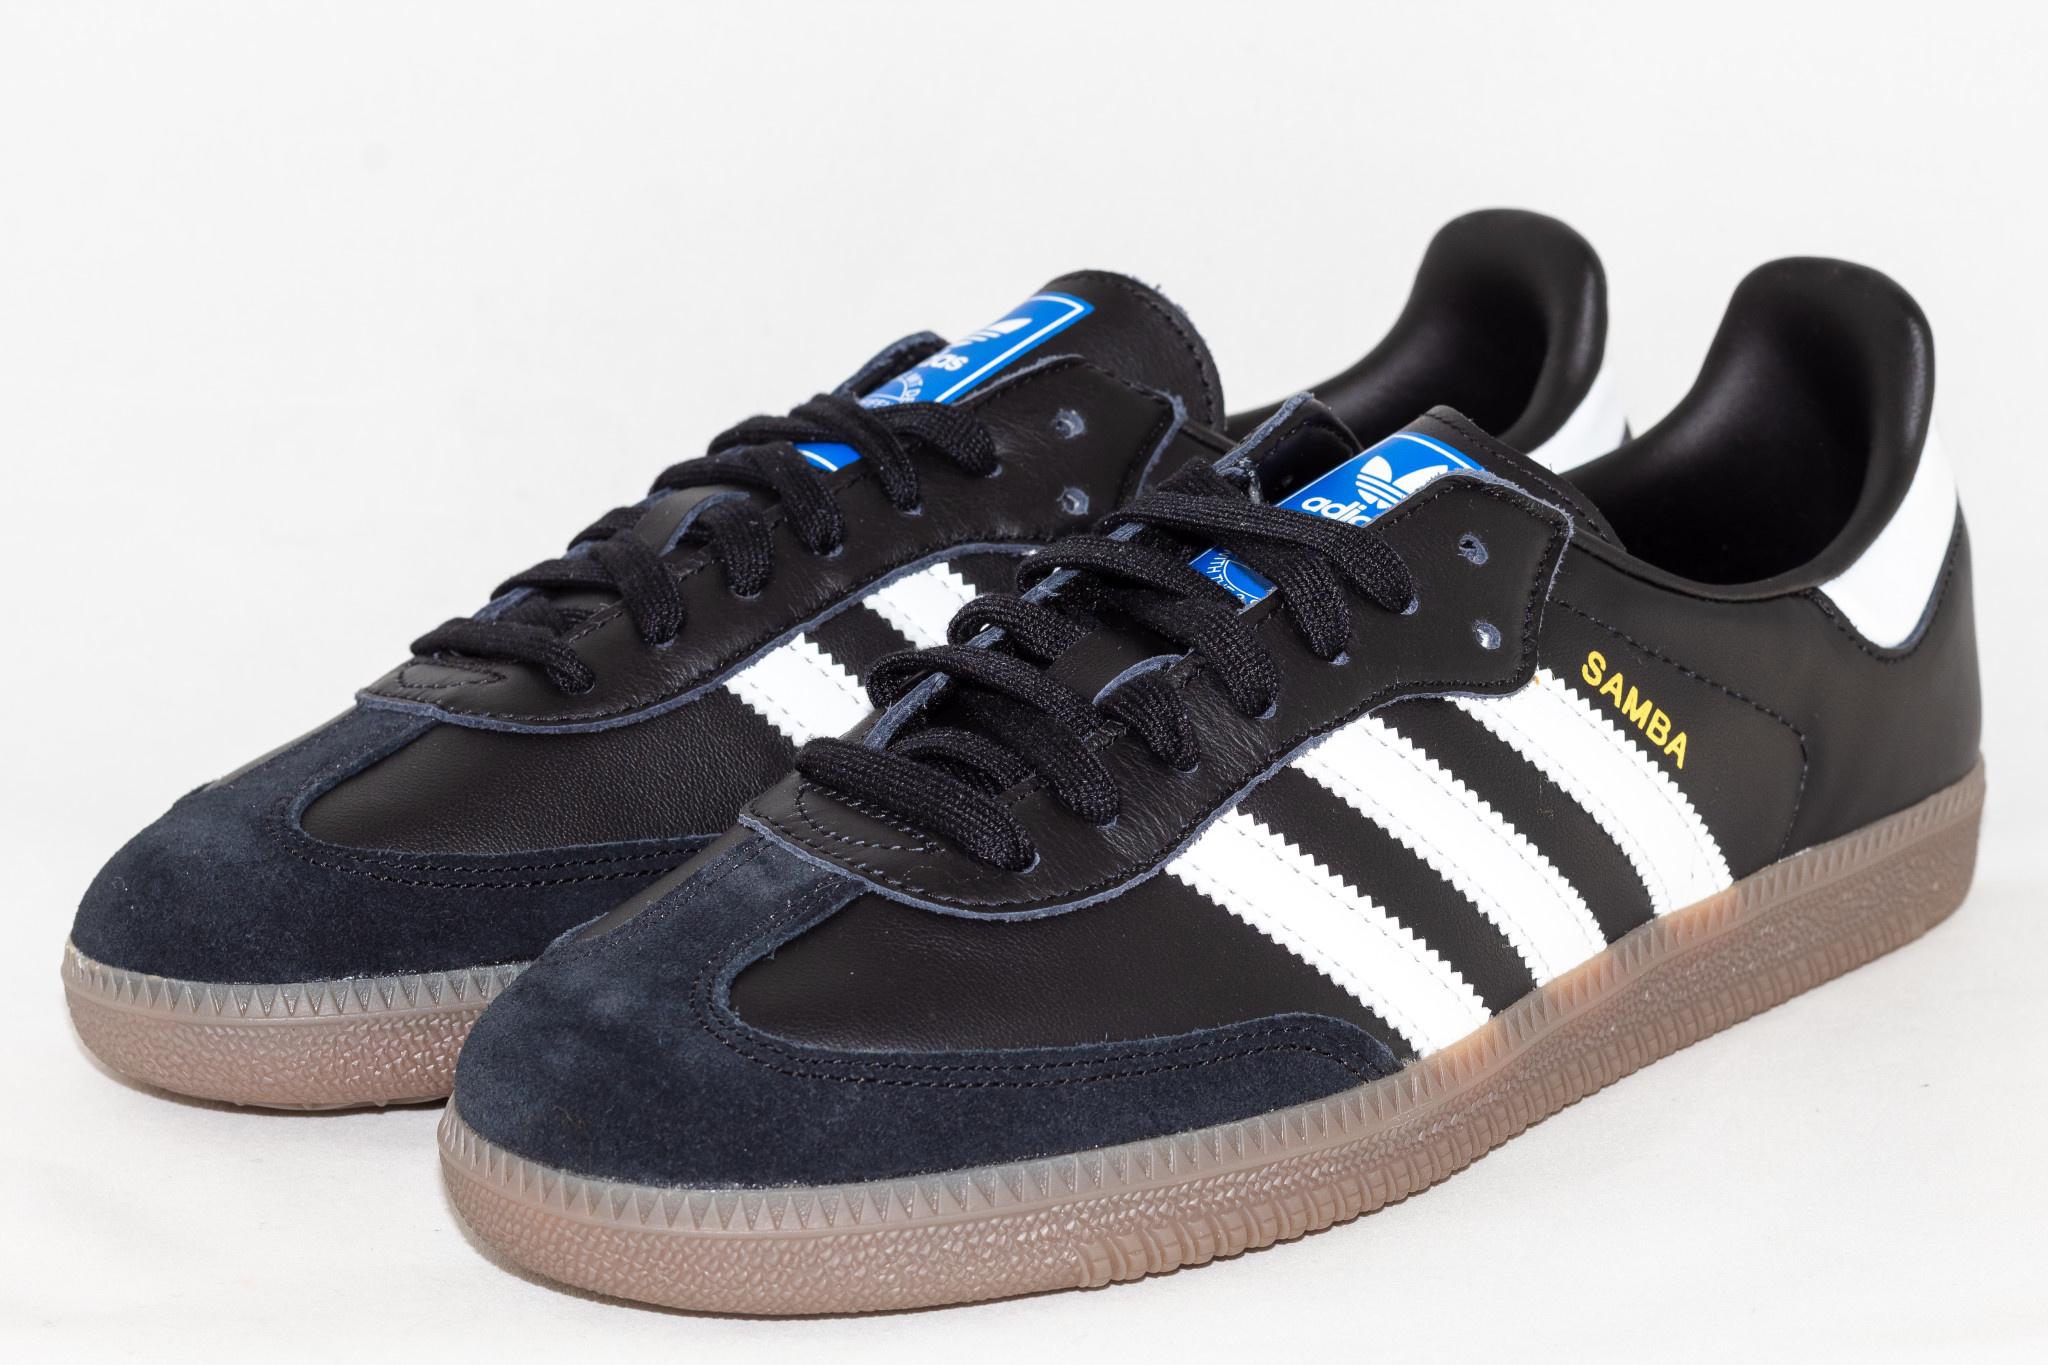 Adidas SAMBA OG Cblack/ Ftwwht/ Gum5